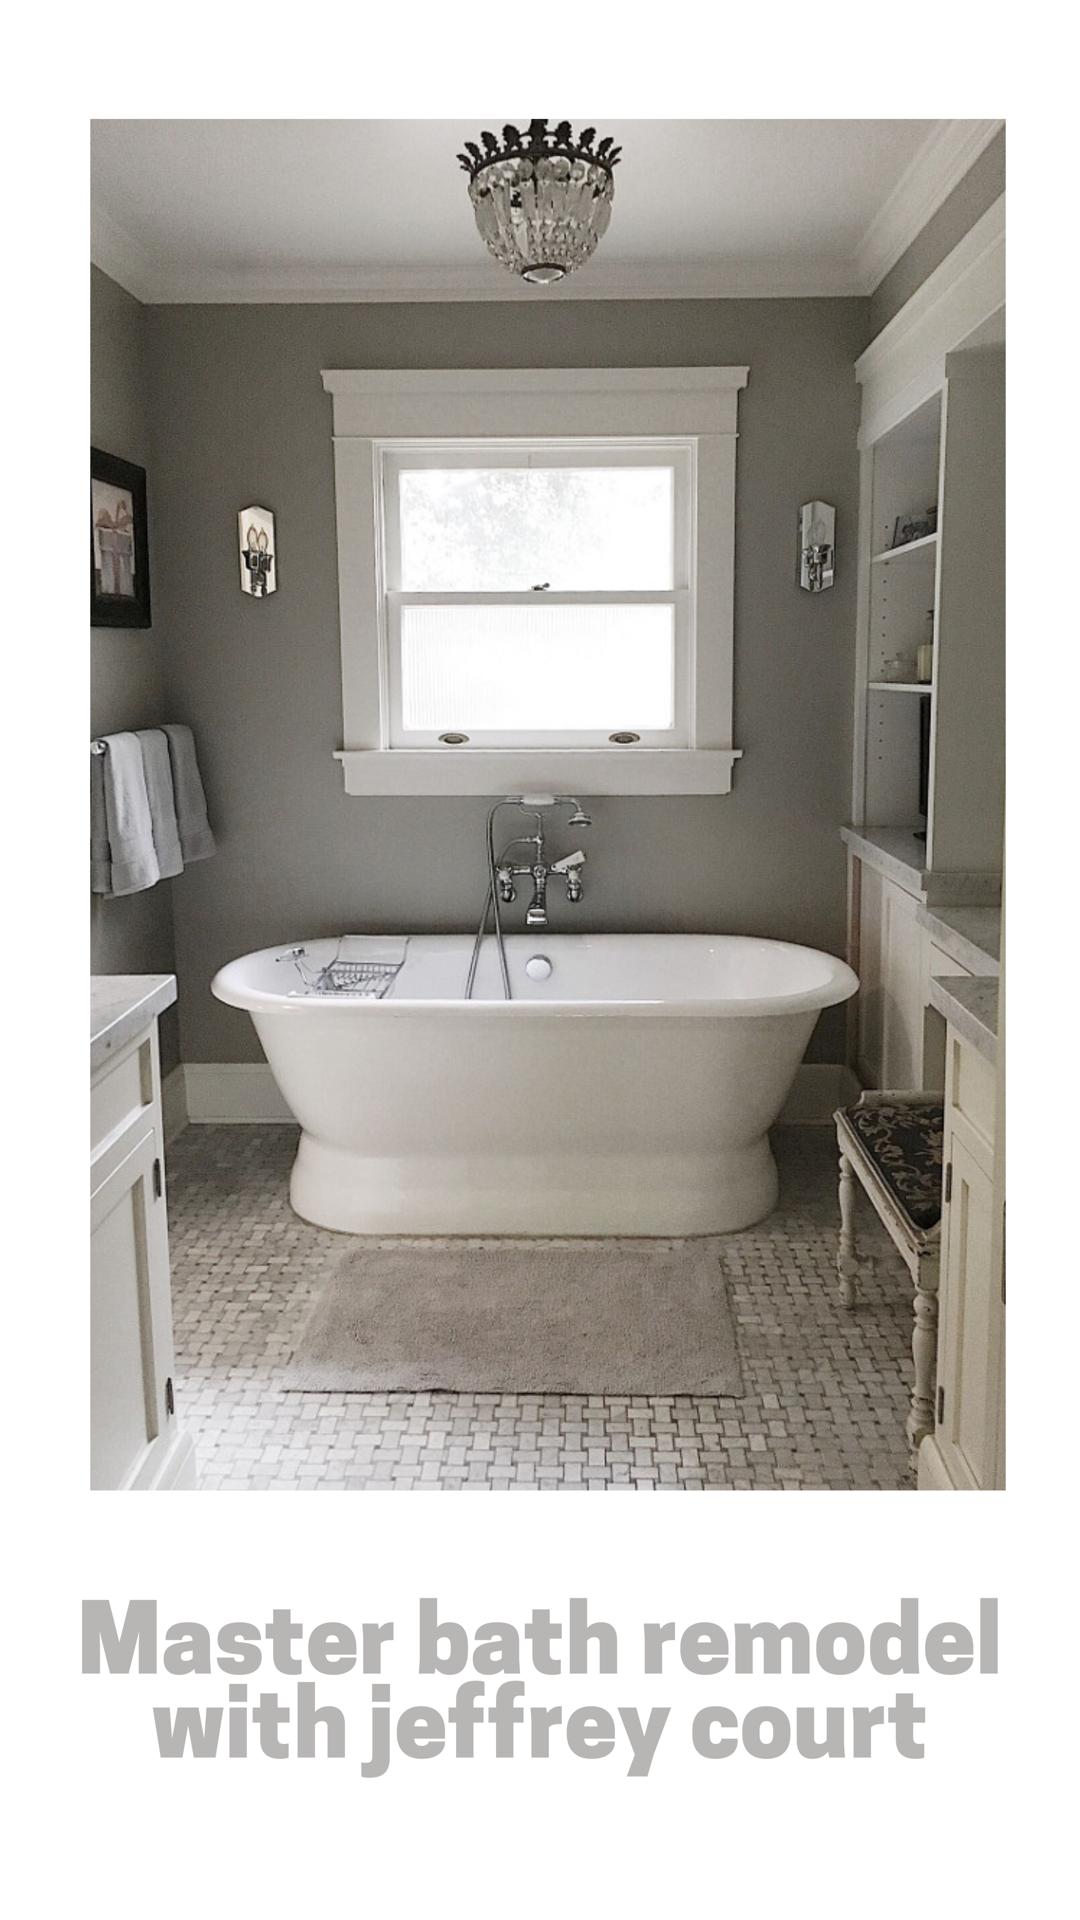 Jeffrey Court Master Bathroom Renovation Challenge Glass Shower Shower Floor Master Bathroom